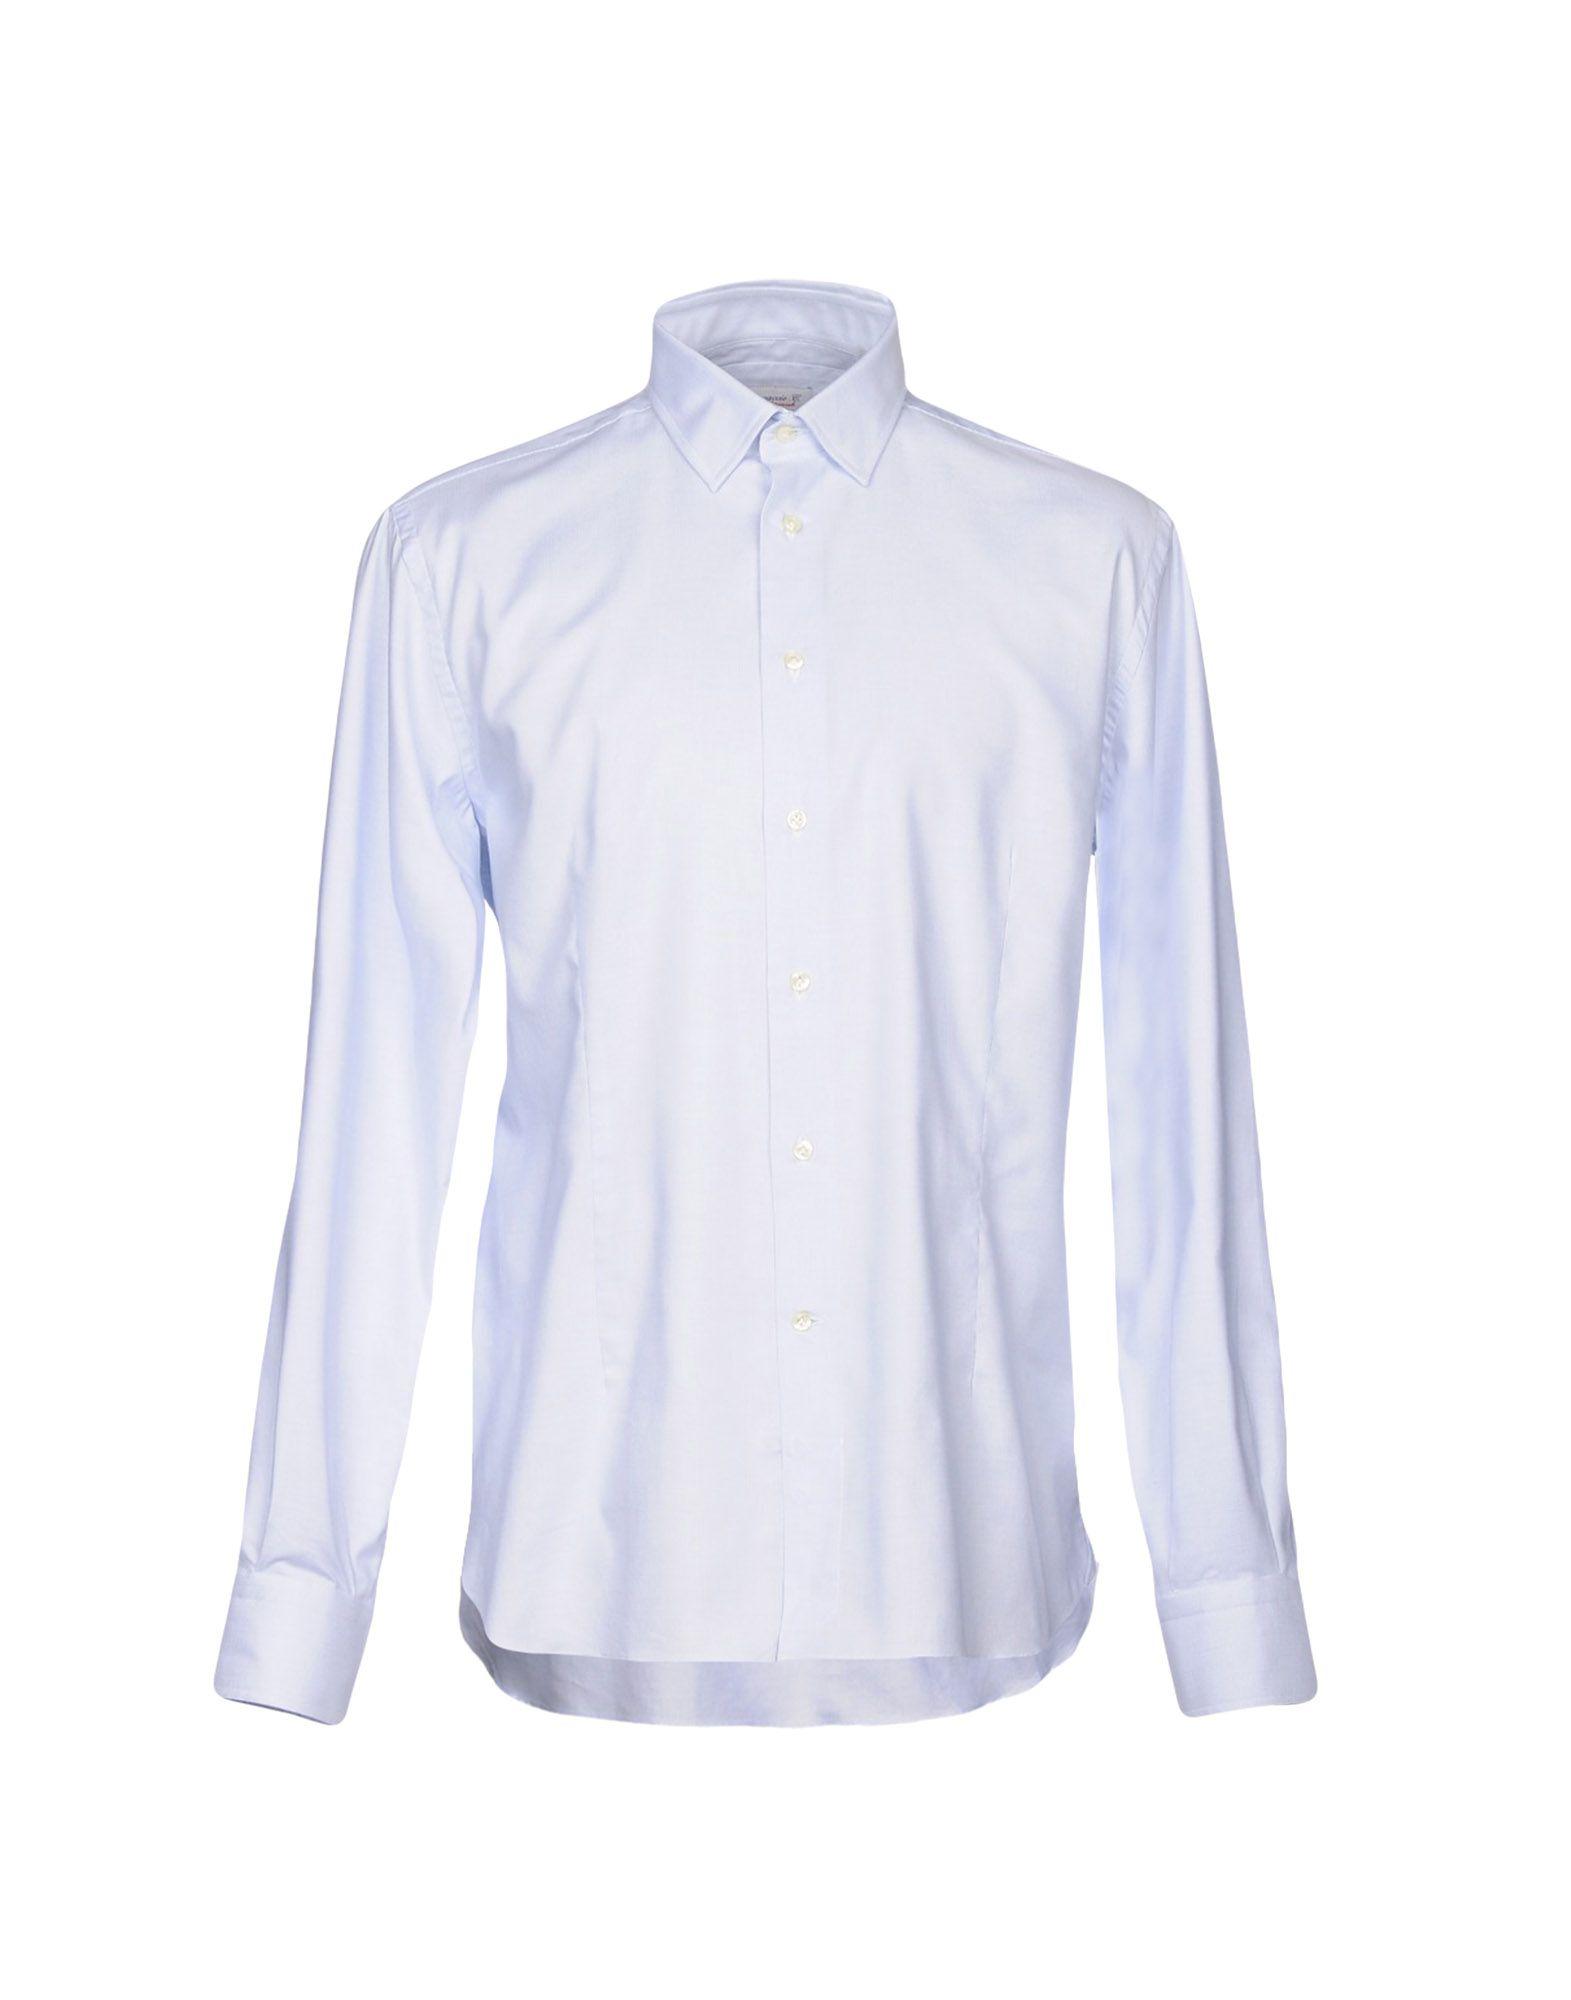 Camicia Tinta Unita Brancaccio Brancaccio Brancaccio C. uomo - 38727632VG 656